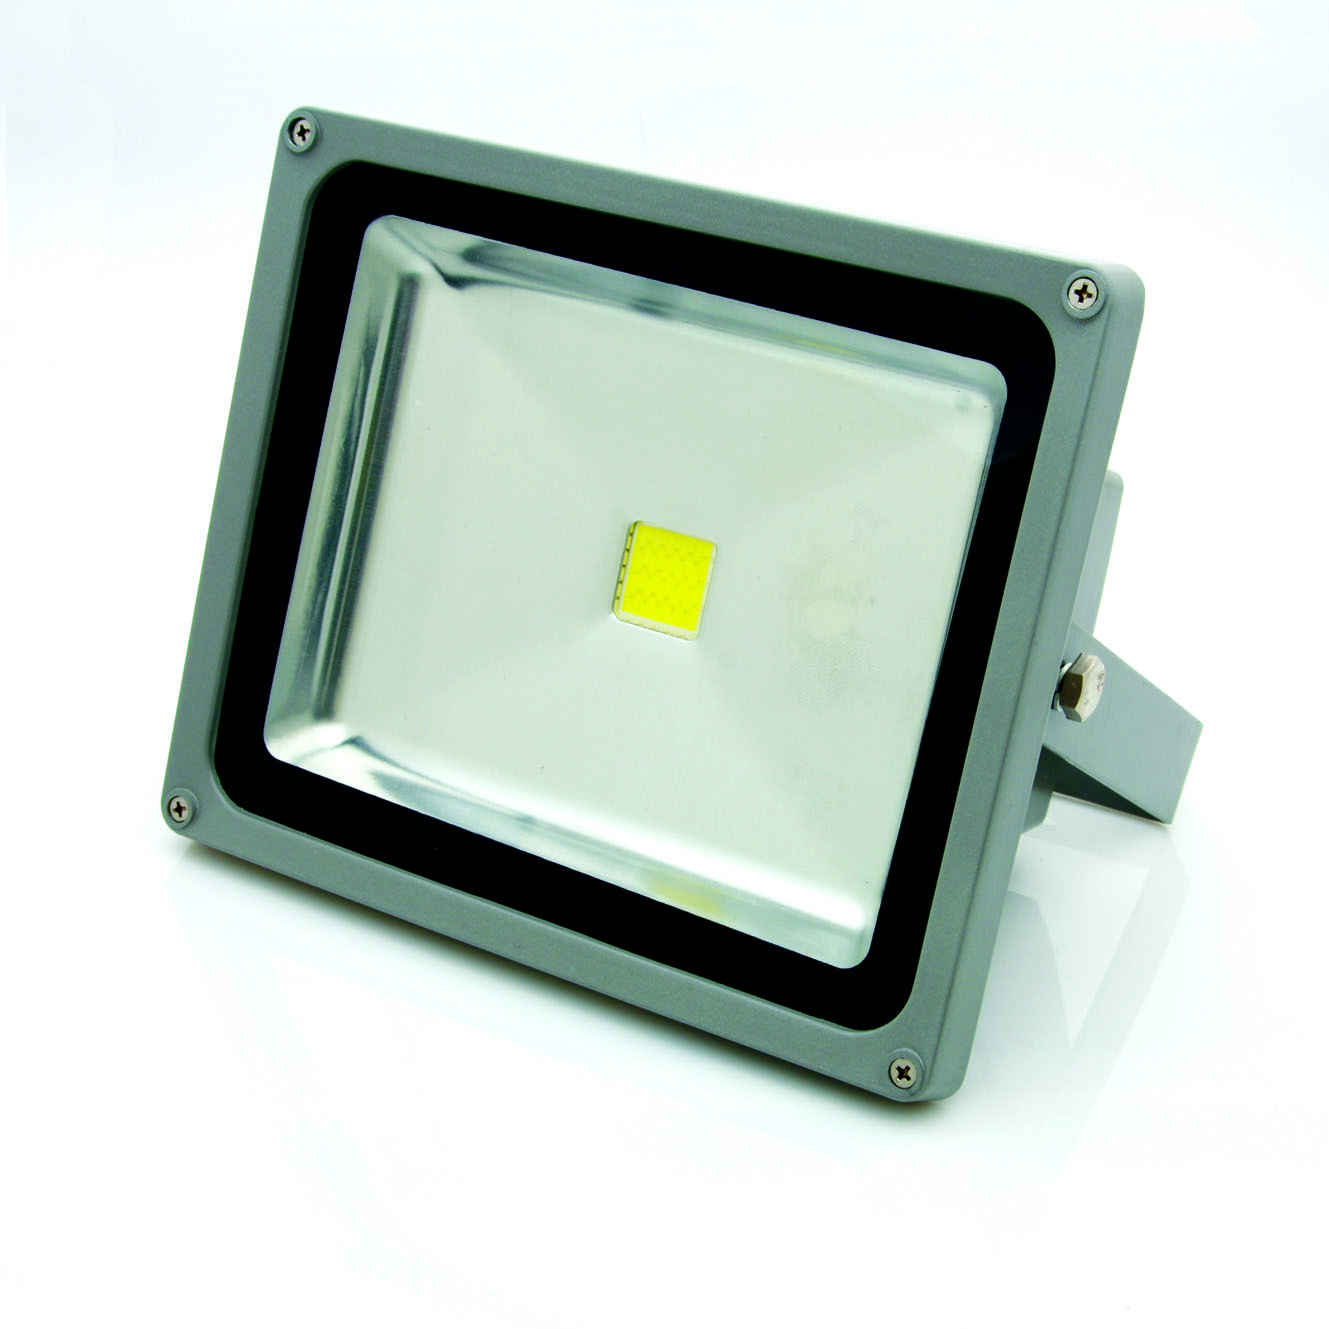 PROIECTOR LED EXTERIOR CLASIC 10W LUMINA ALBA CALDA